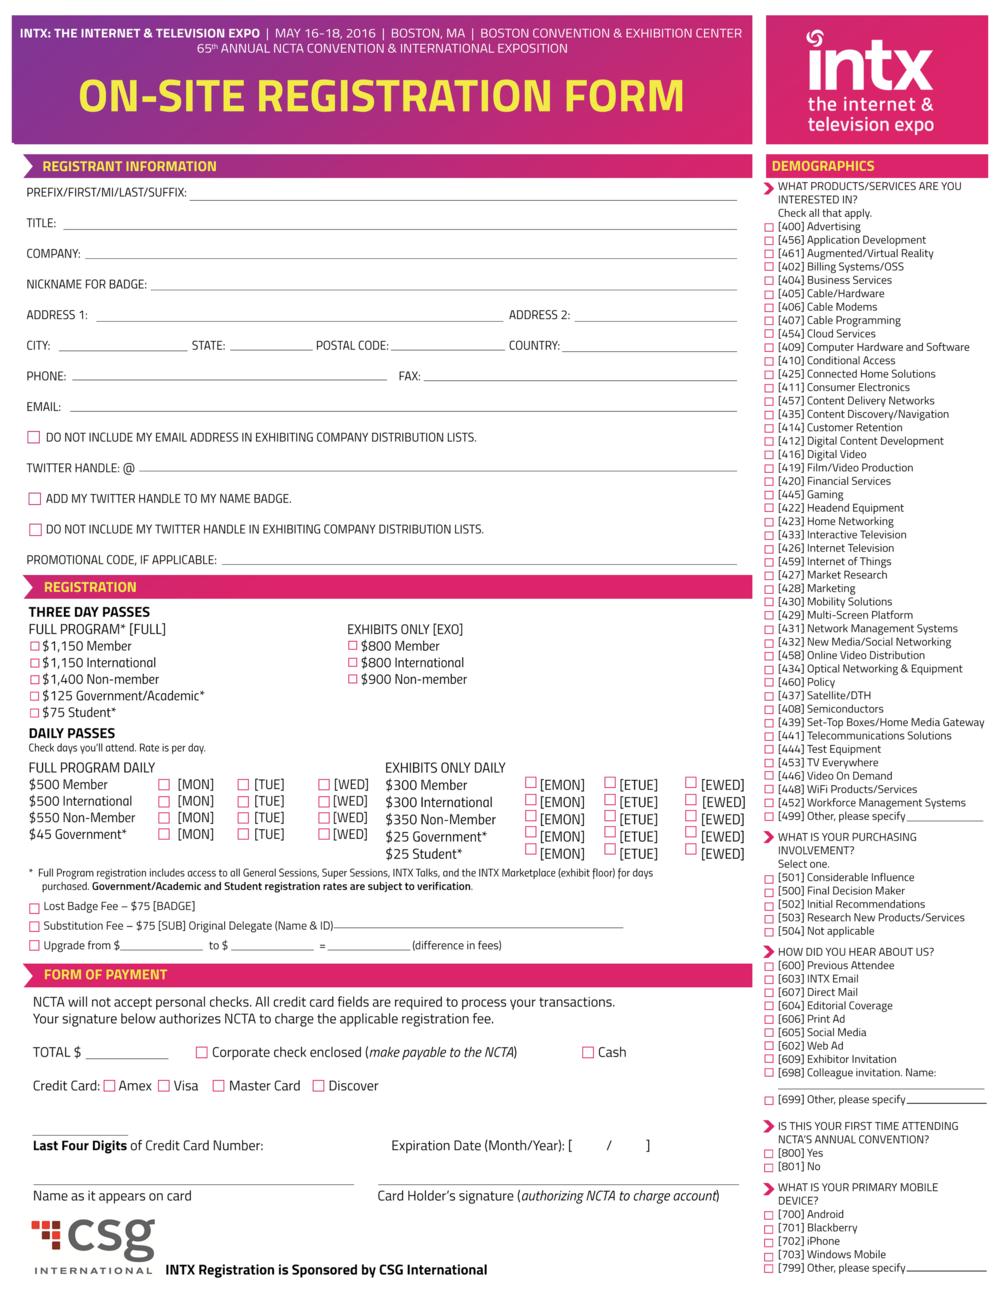 INTX 2016 Registration Form NCTA 2016